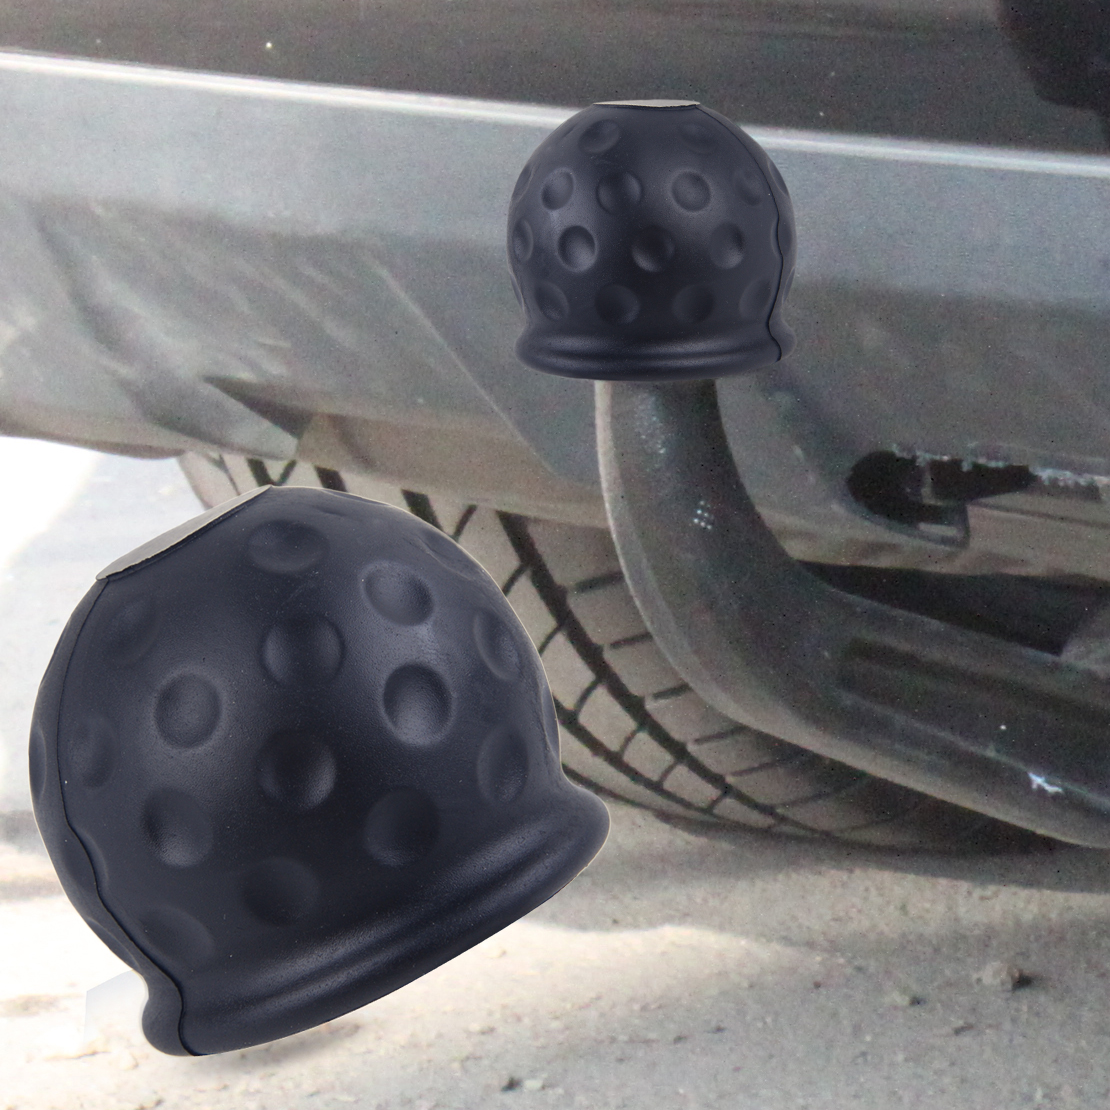 CITALL Car Rubber Black 50mm Tow Ball Towball Protector Cover Cap Hitch Caravan Trailer